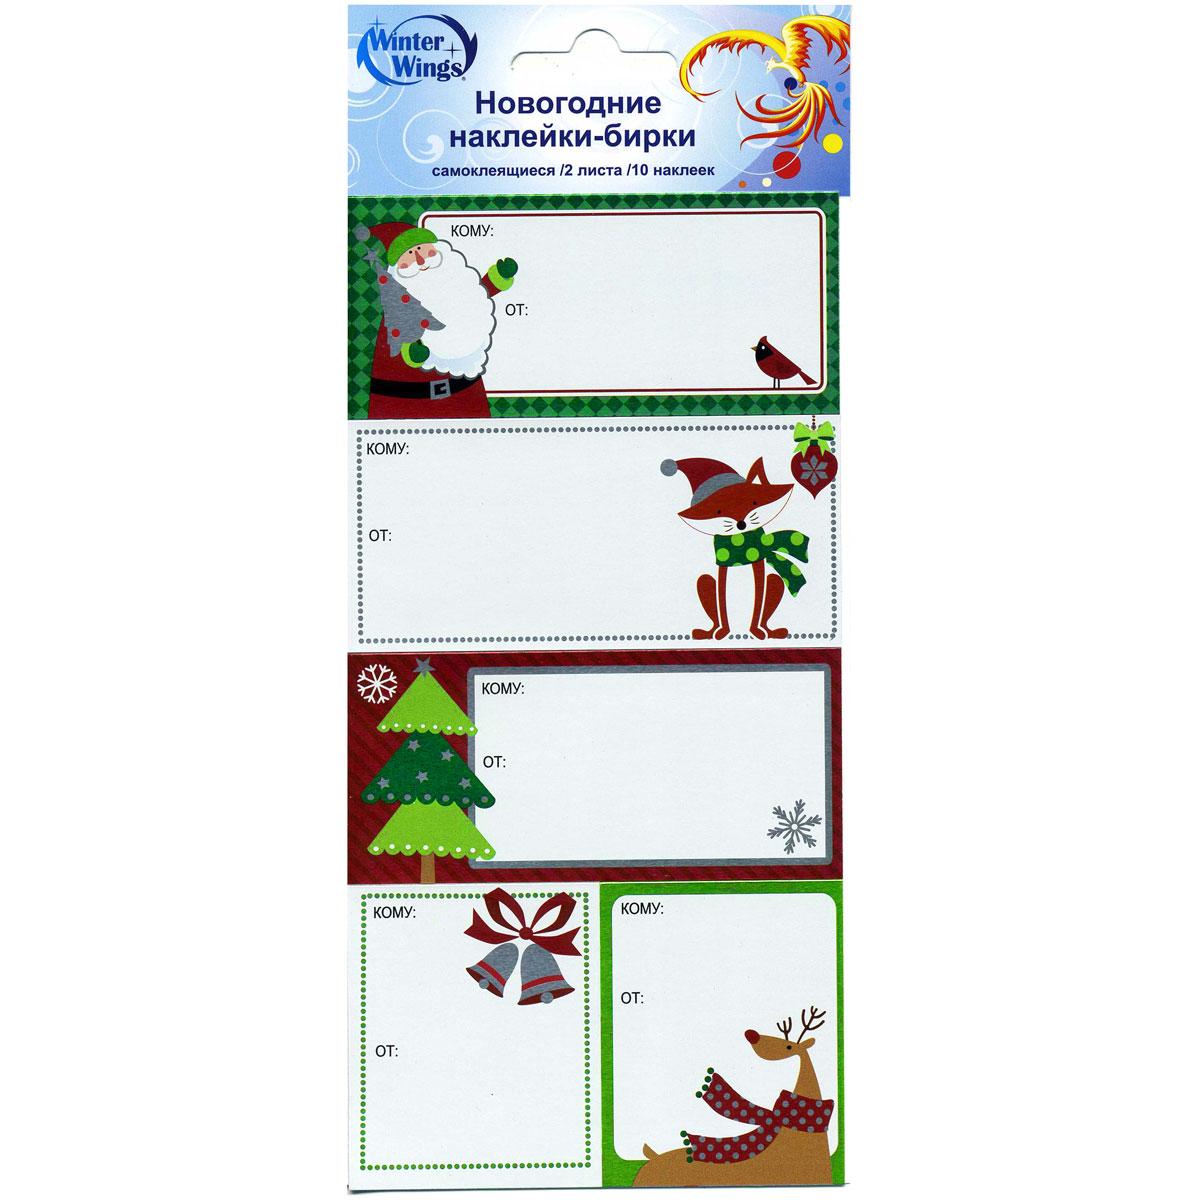 Набор наклеек для оформления подарков Winter Wings, 10 х 20 см, 2 листа. N09380 создай монстрика 2 фигурки на подставке 3 листа наклеек